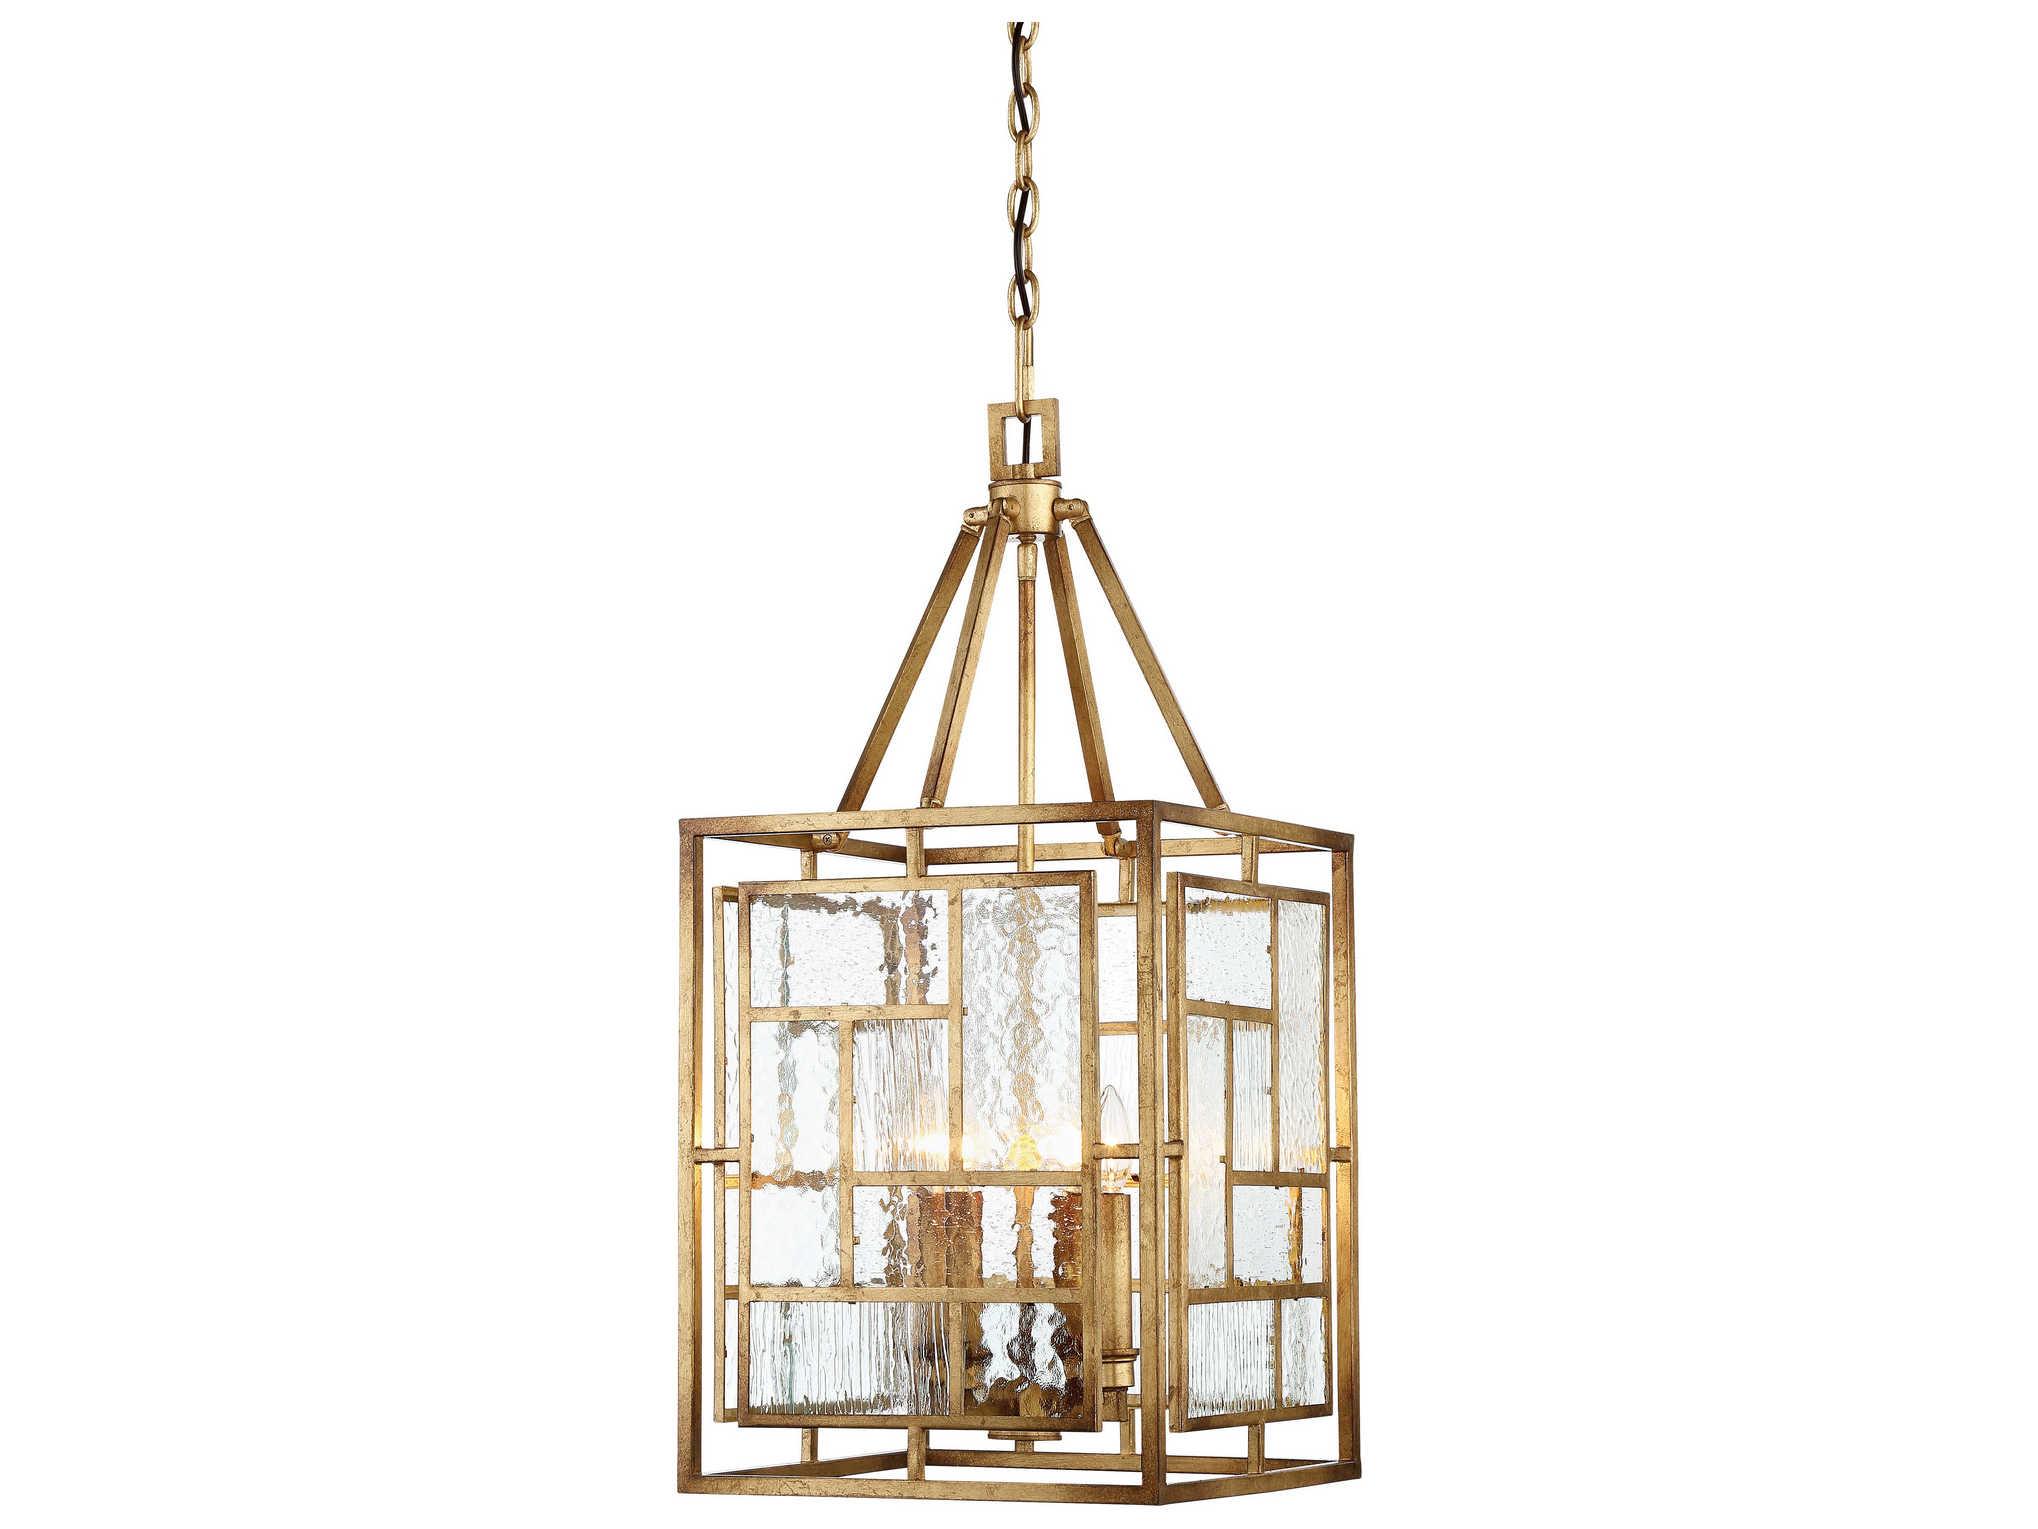 Progress Lighting Riverside Collection 4 Light Heirloom: Metropolitan Lighting Edgemont Park Pandora Gold Leaf Four